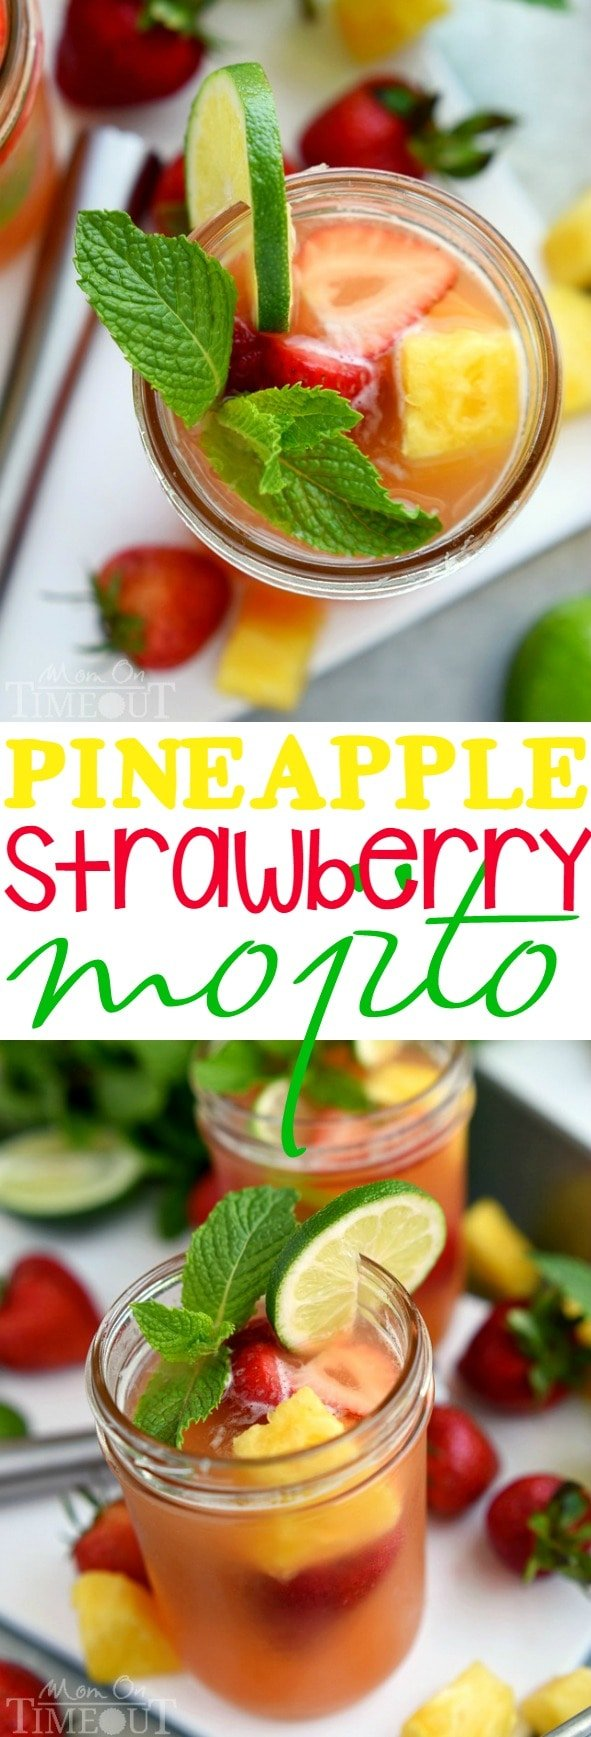 Strawberry-Pineapple-Mint Juice Recipe — Dishmaps